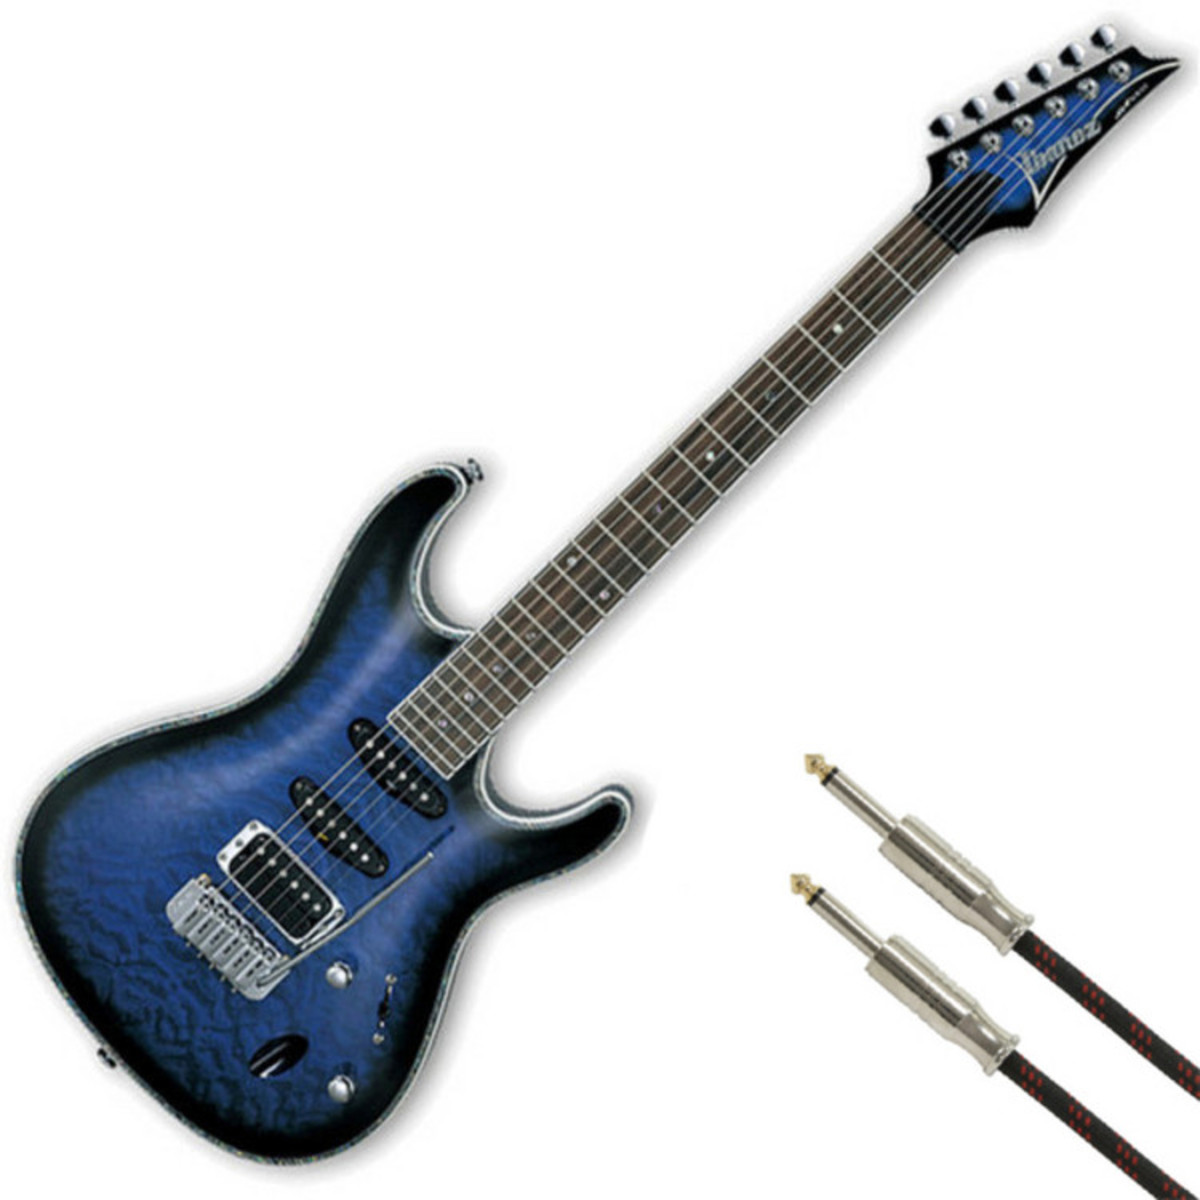 discibanez sas36qm electric guitar cornflower blue burst free gift at gear4music. Black Bedroom Furniture Sets. Home Design Ideas